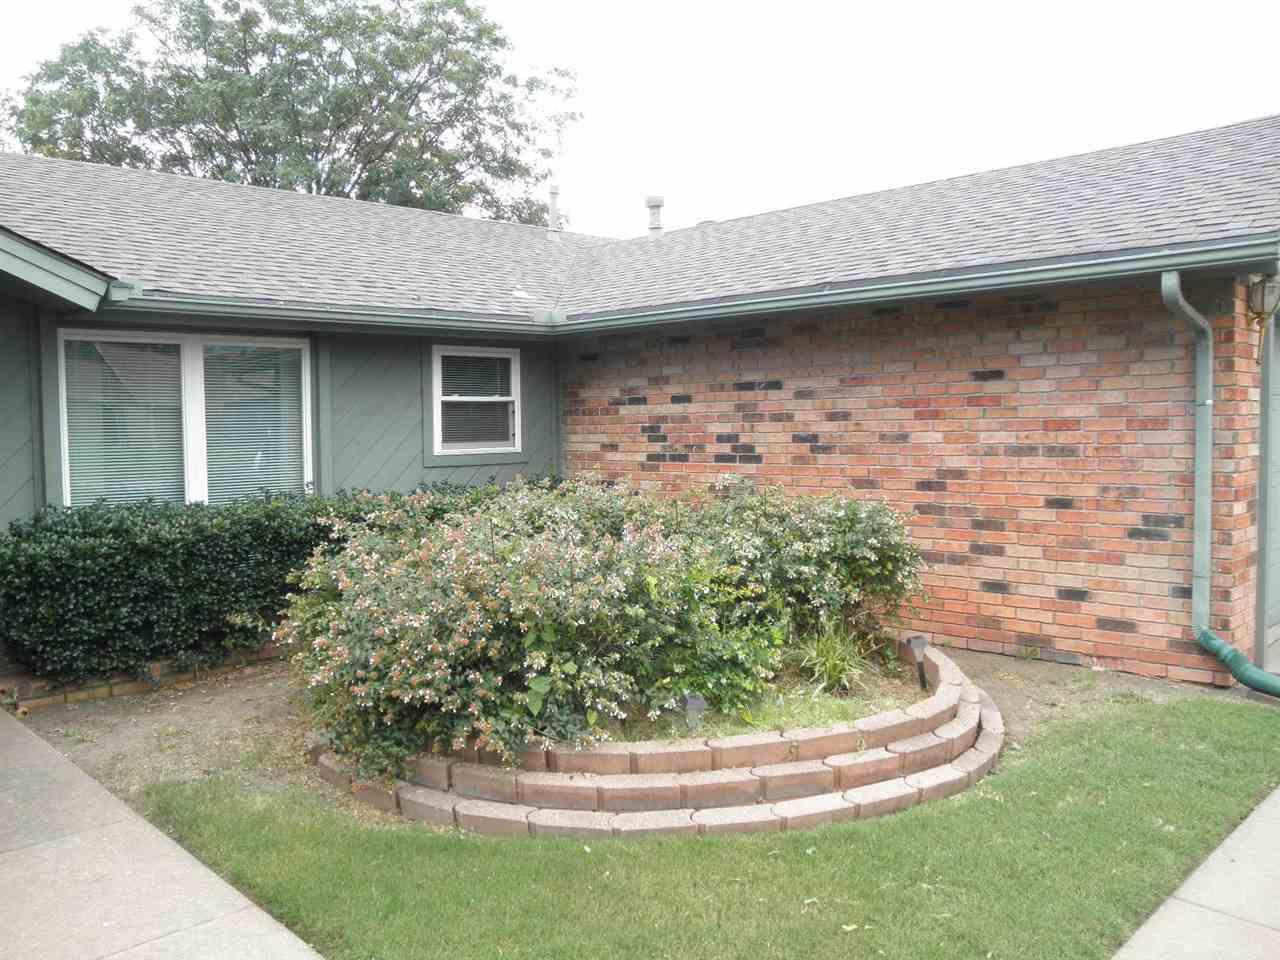 #century21groupone,#homesforsaleponcacity, #poncacityrealestate | 620 Shannon  Ponca City, OK 74601 4